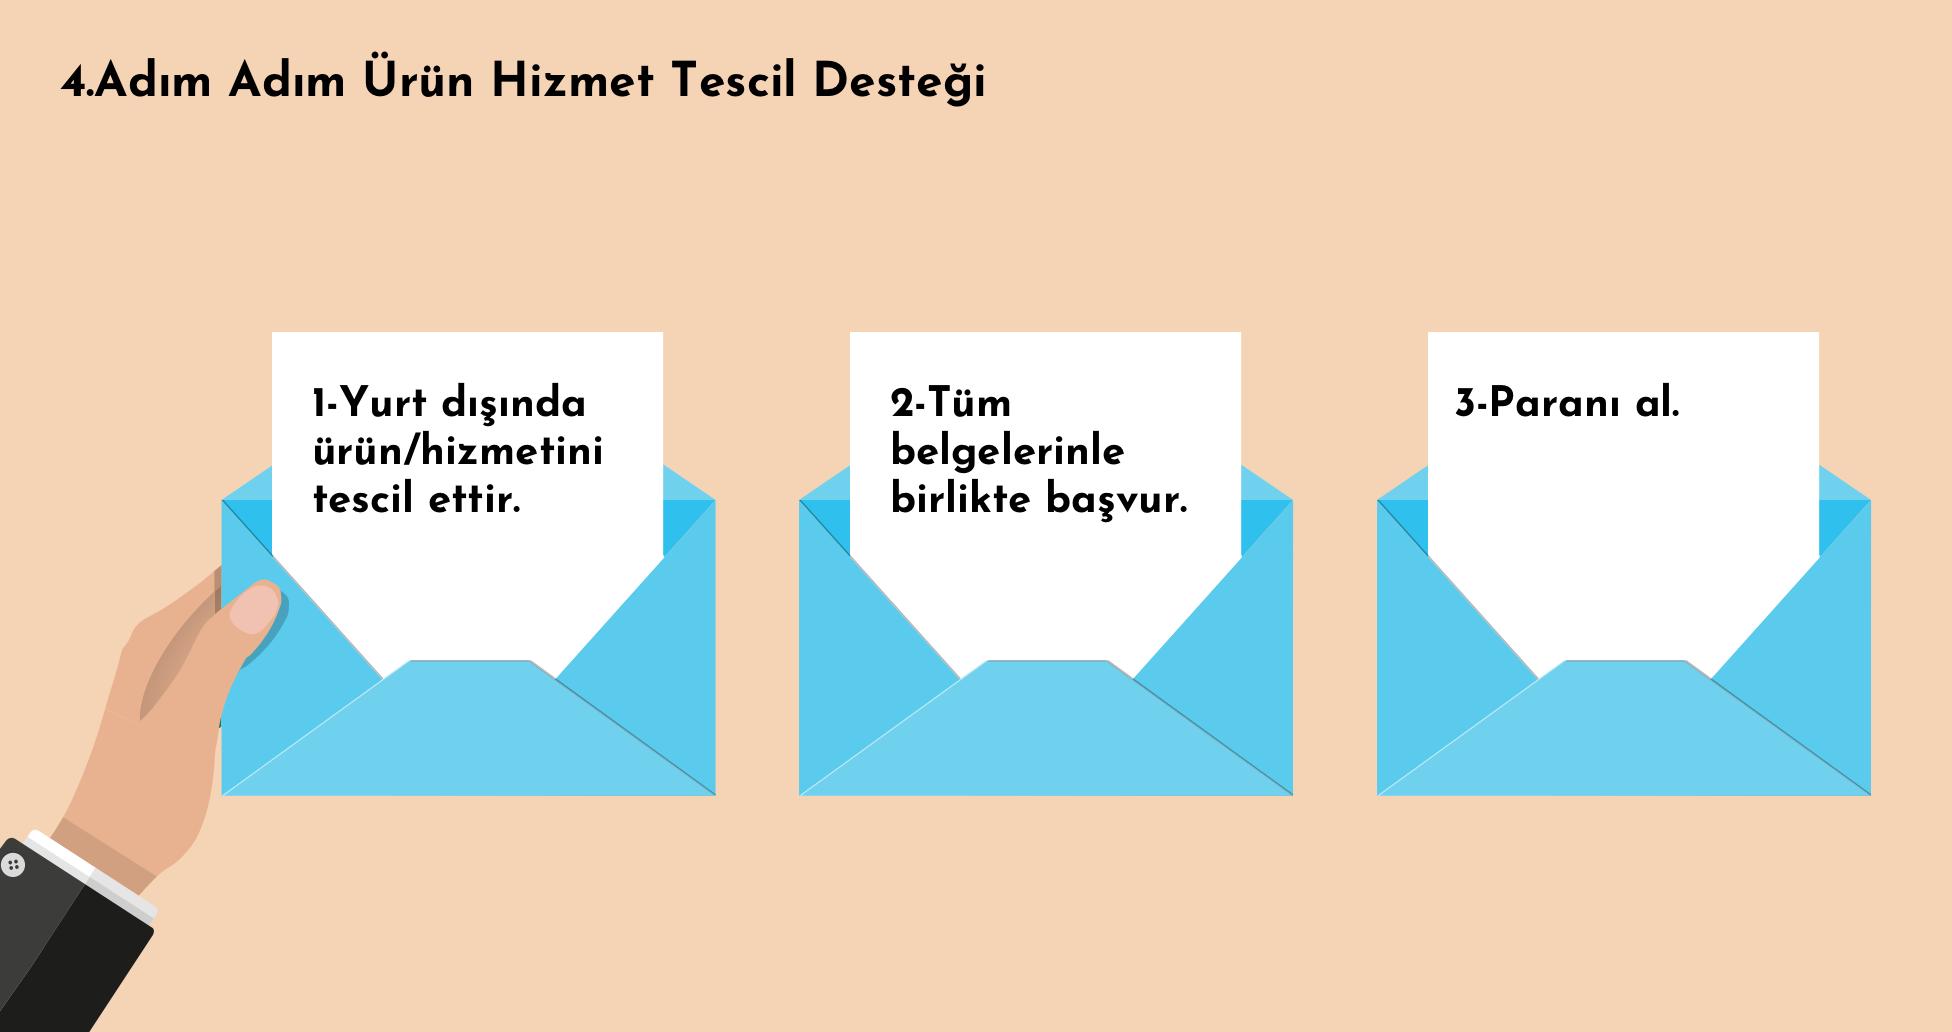 http://novatesvikler.com/wp-content/uploads/2021/02/Adim-Adim-Urun-Hizmet-Semasi.png